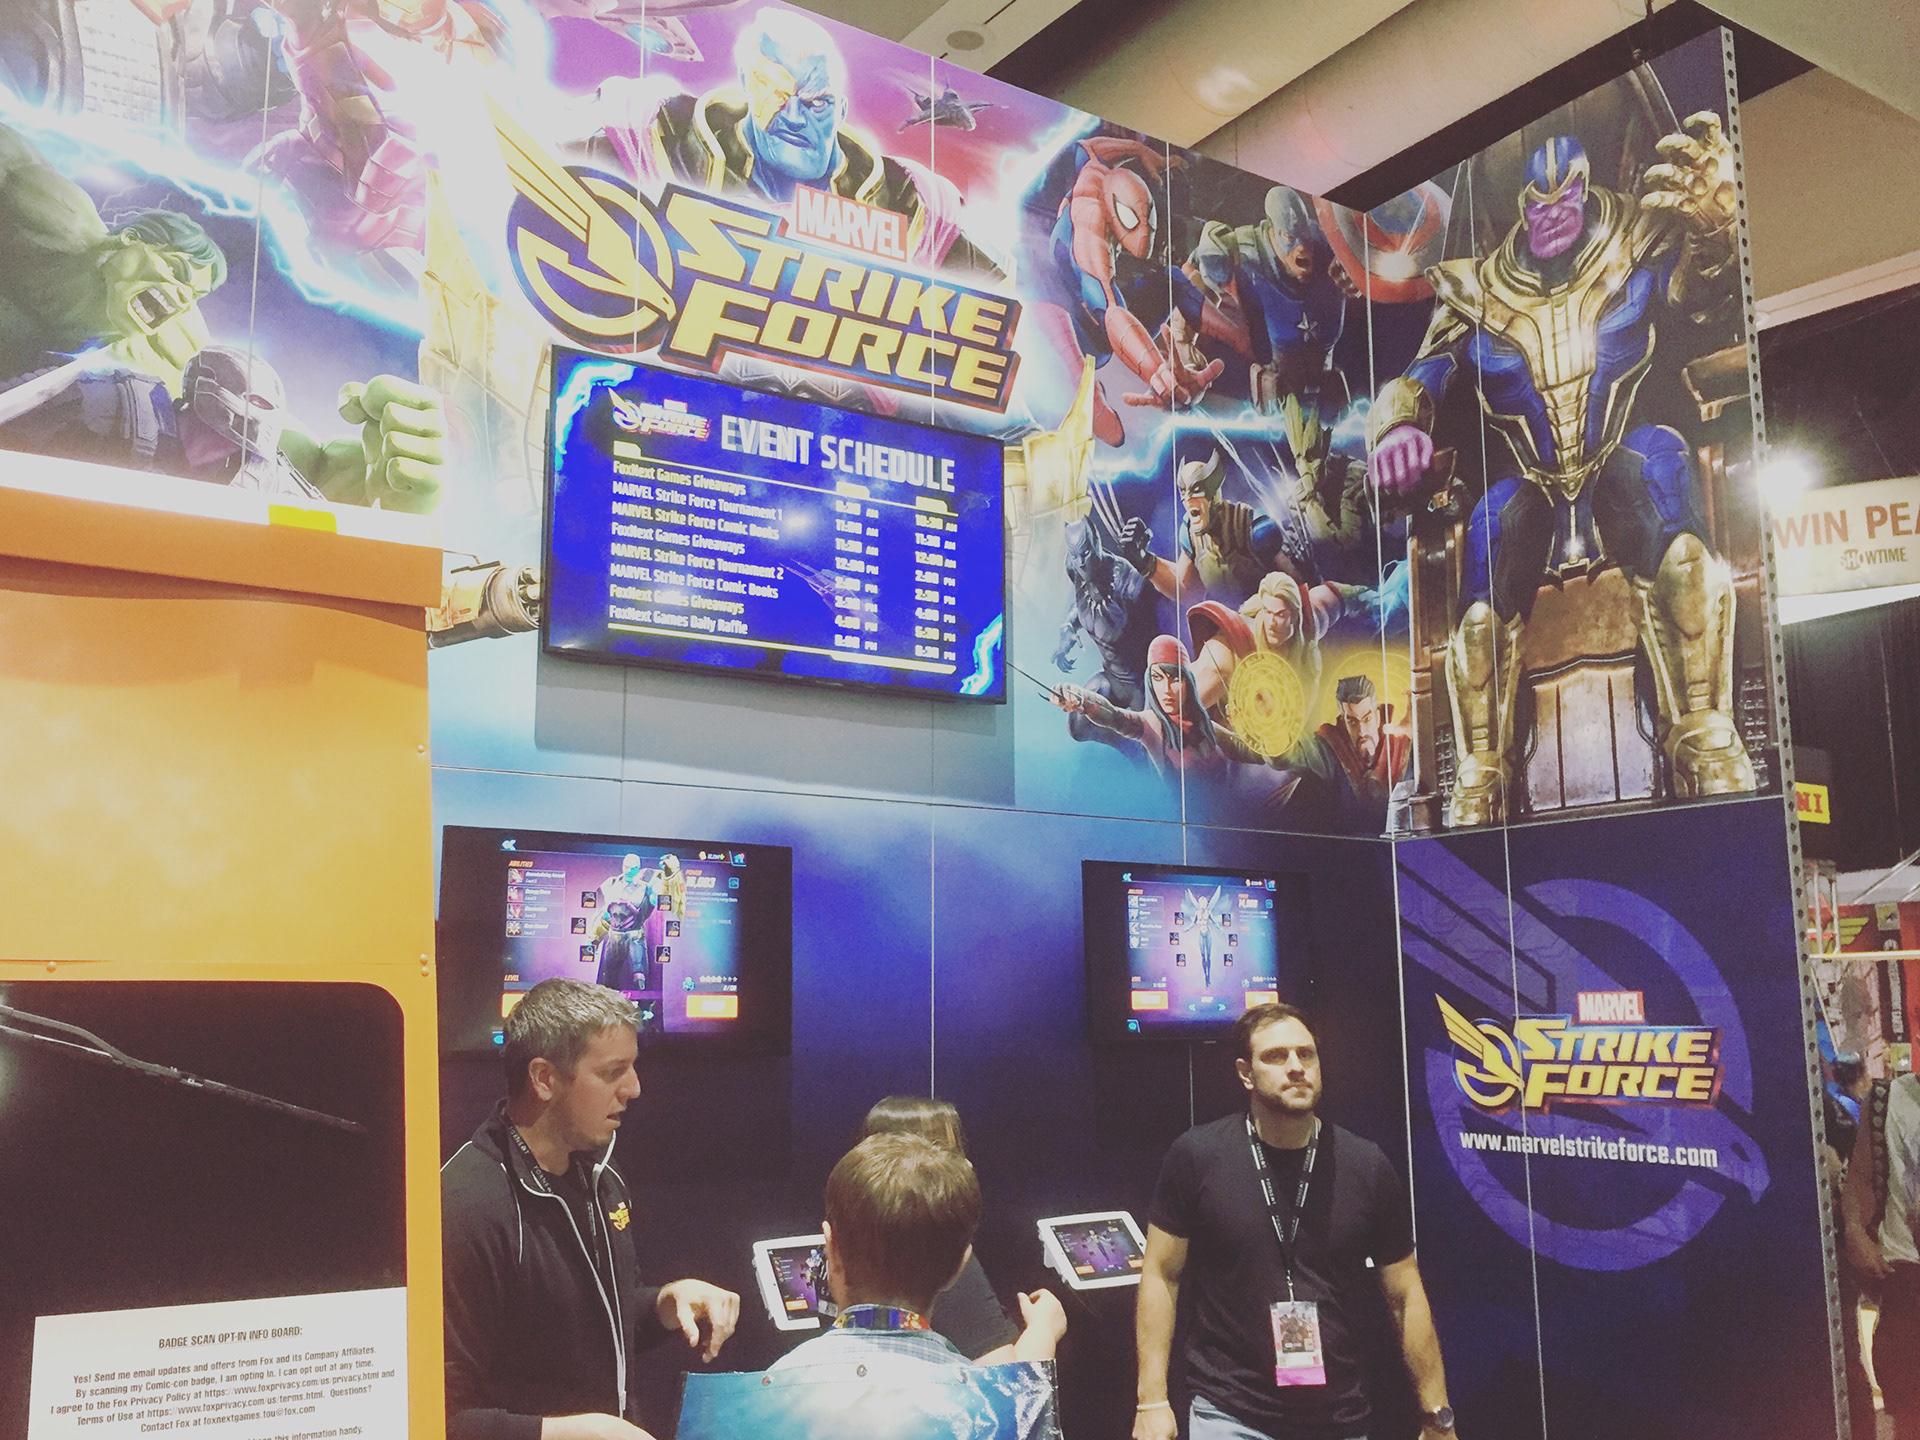 Steve Espinoza - Marvel Strike Force Marketing Assets